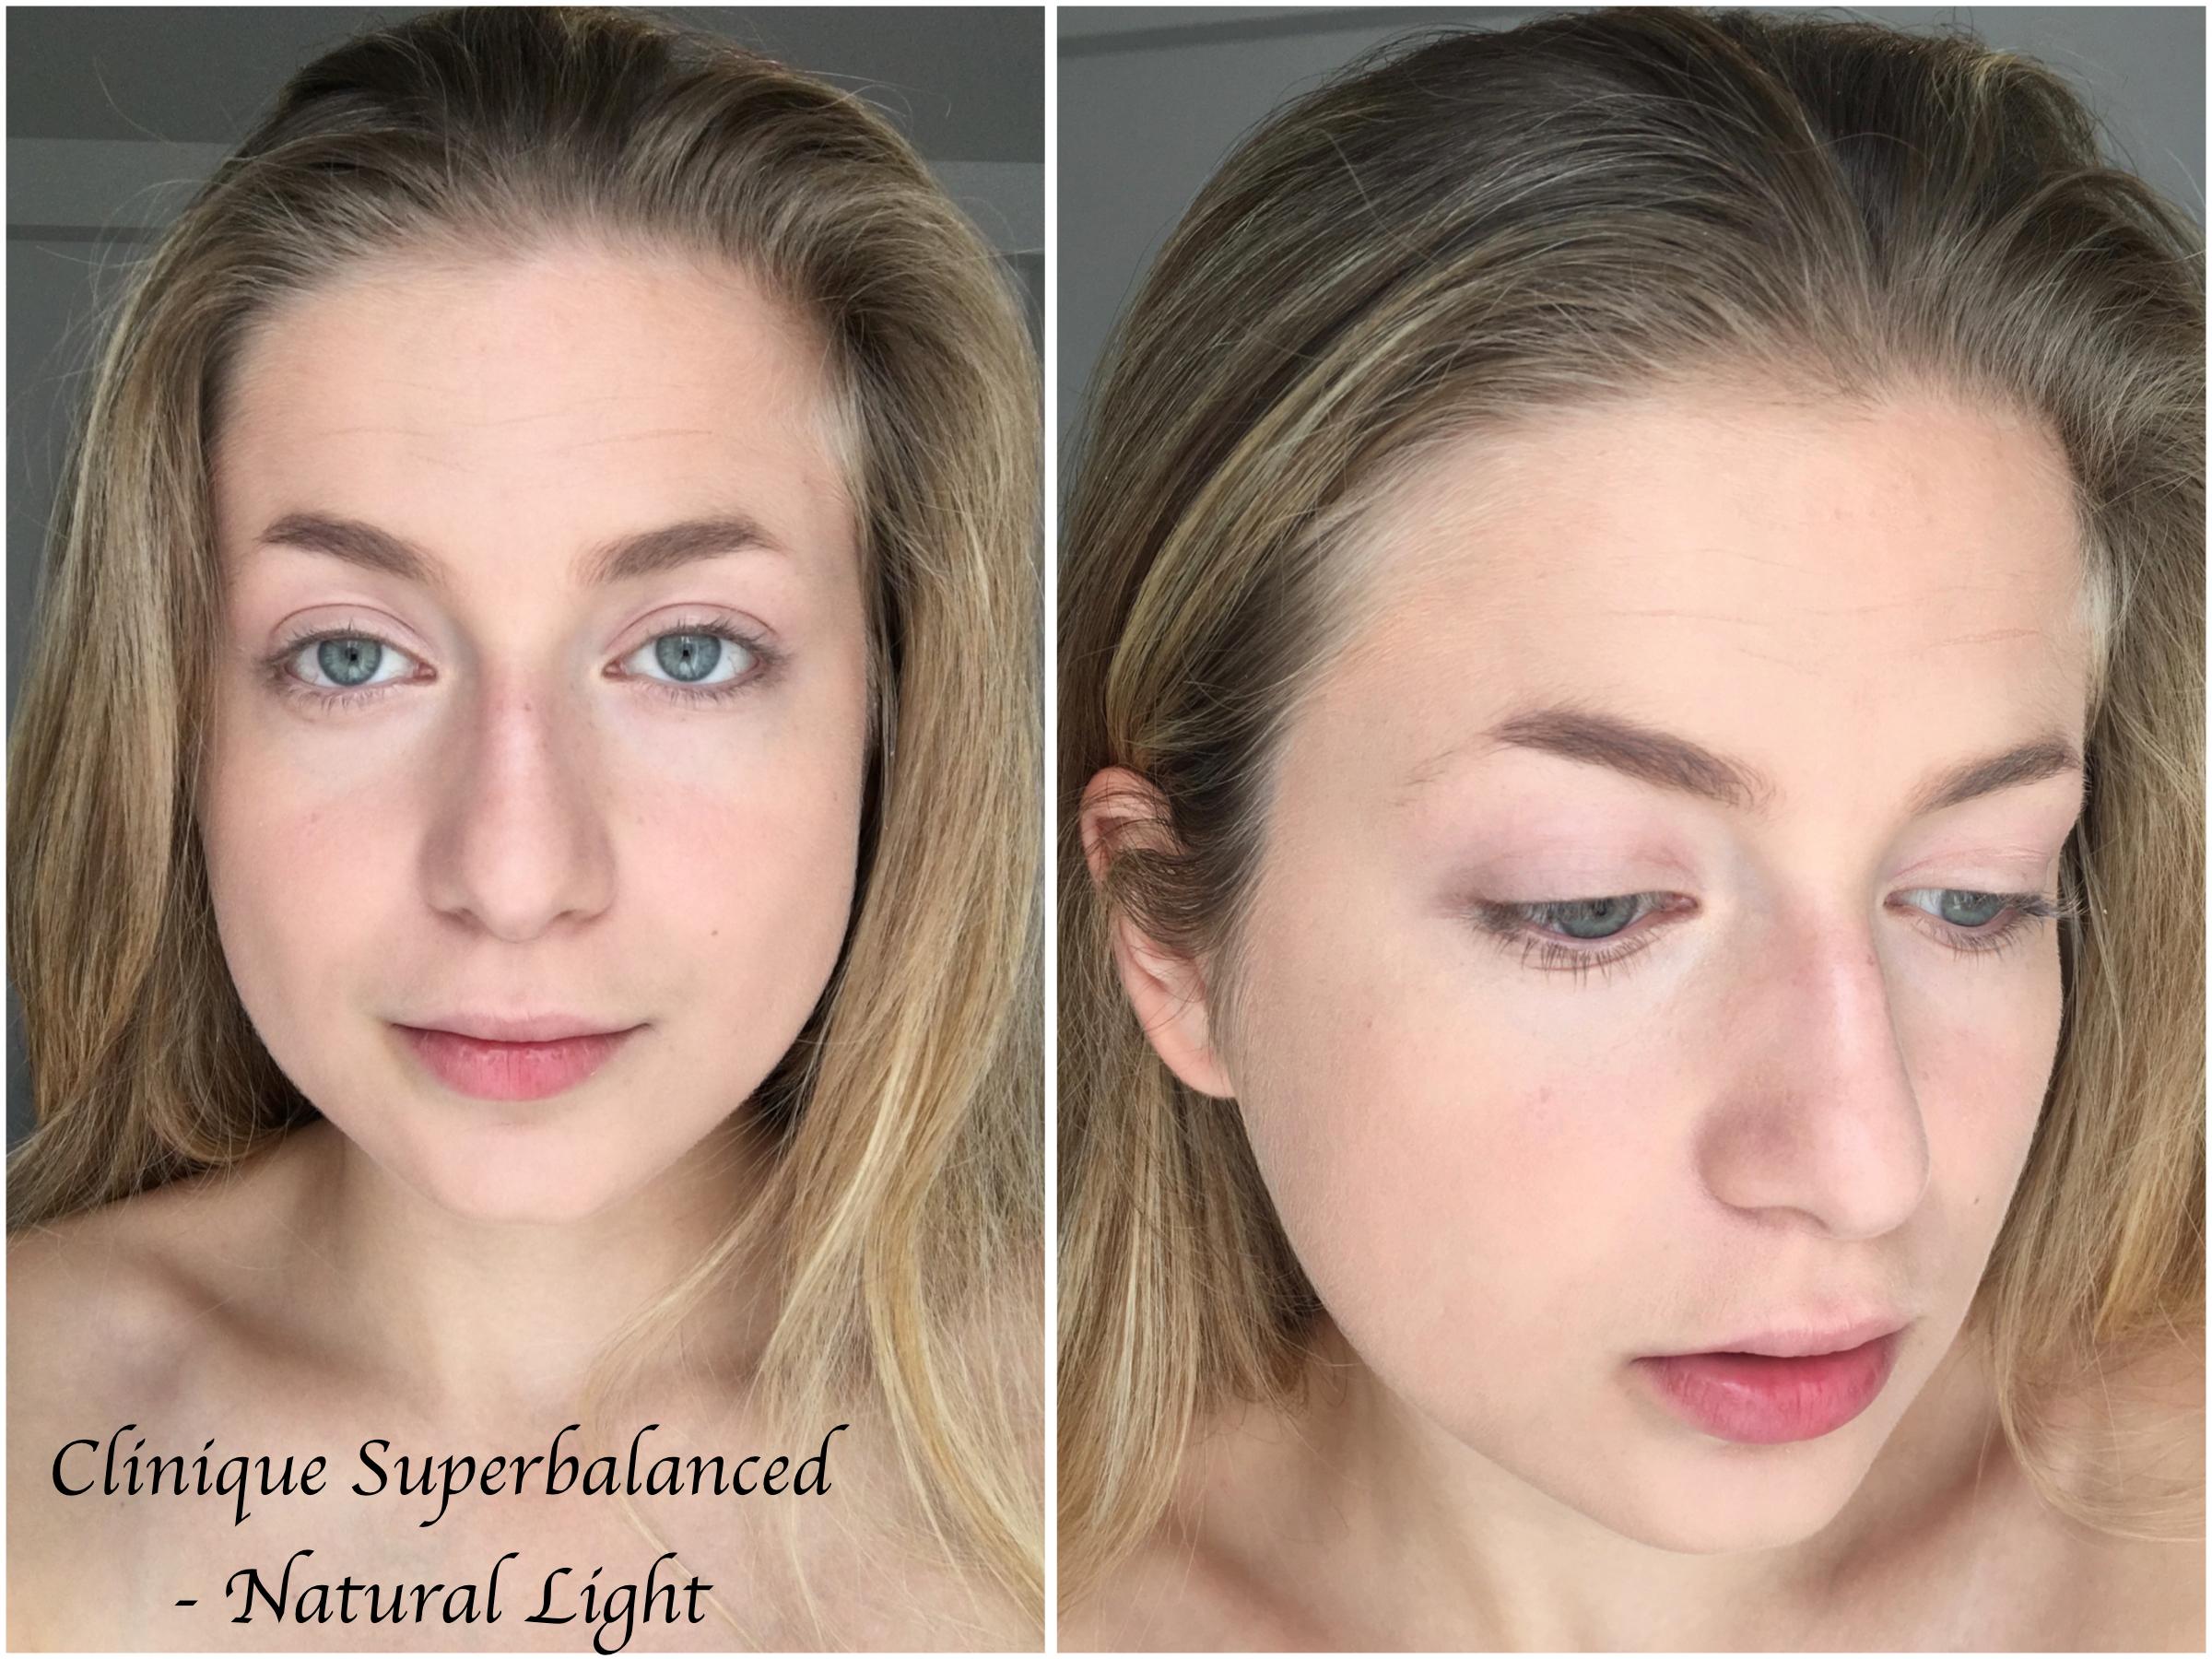 clinique superbalanced makeup foundation review swatches